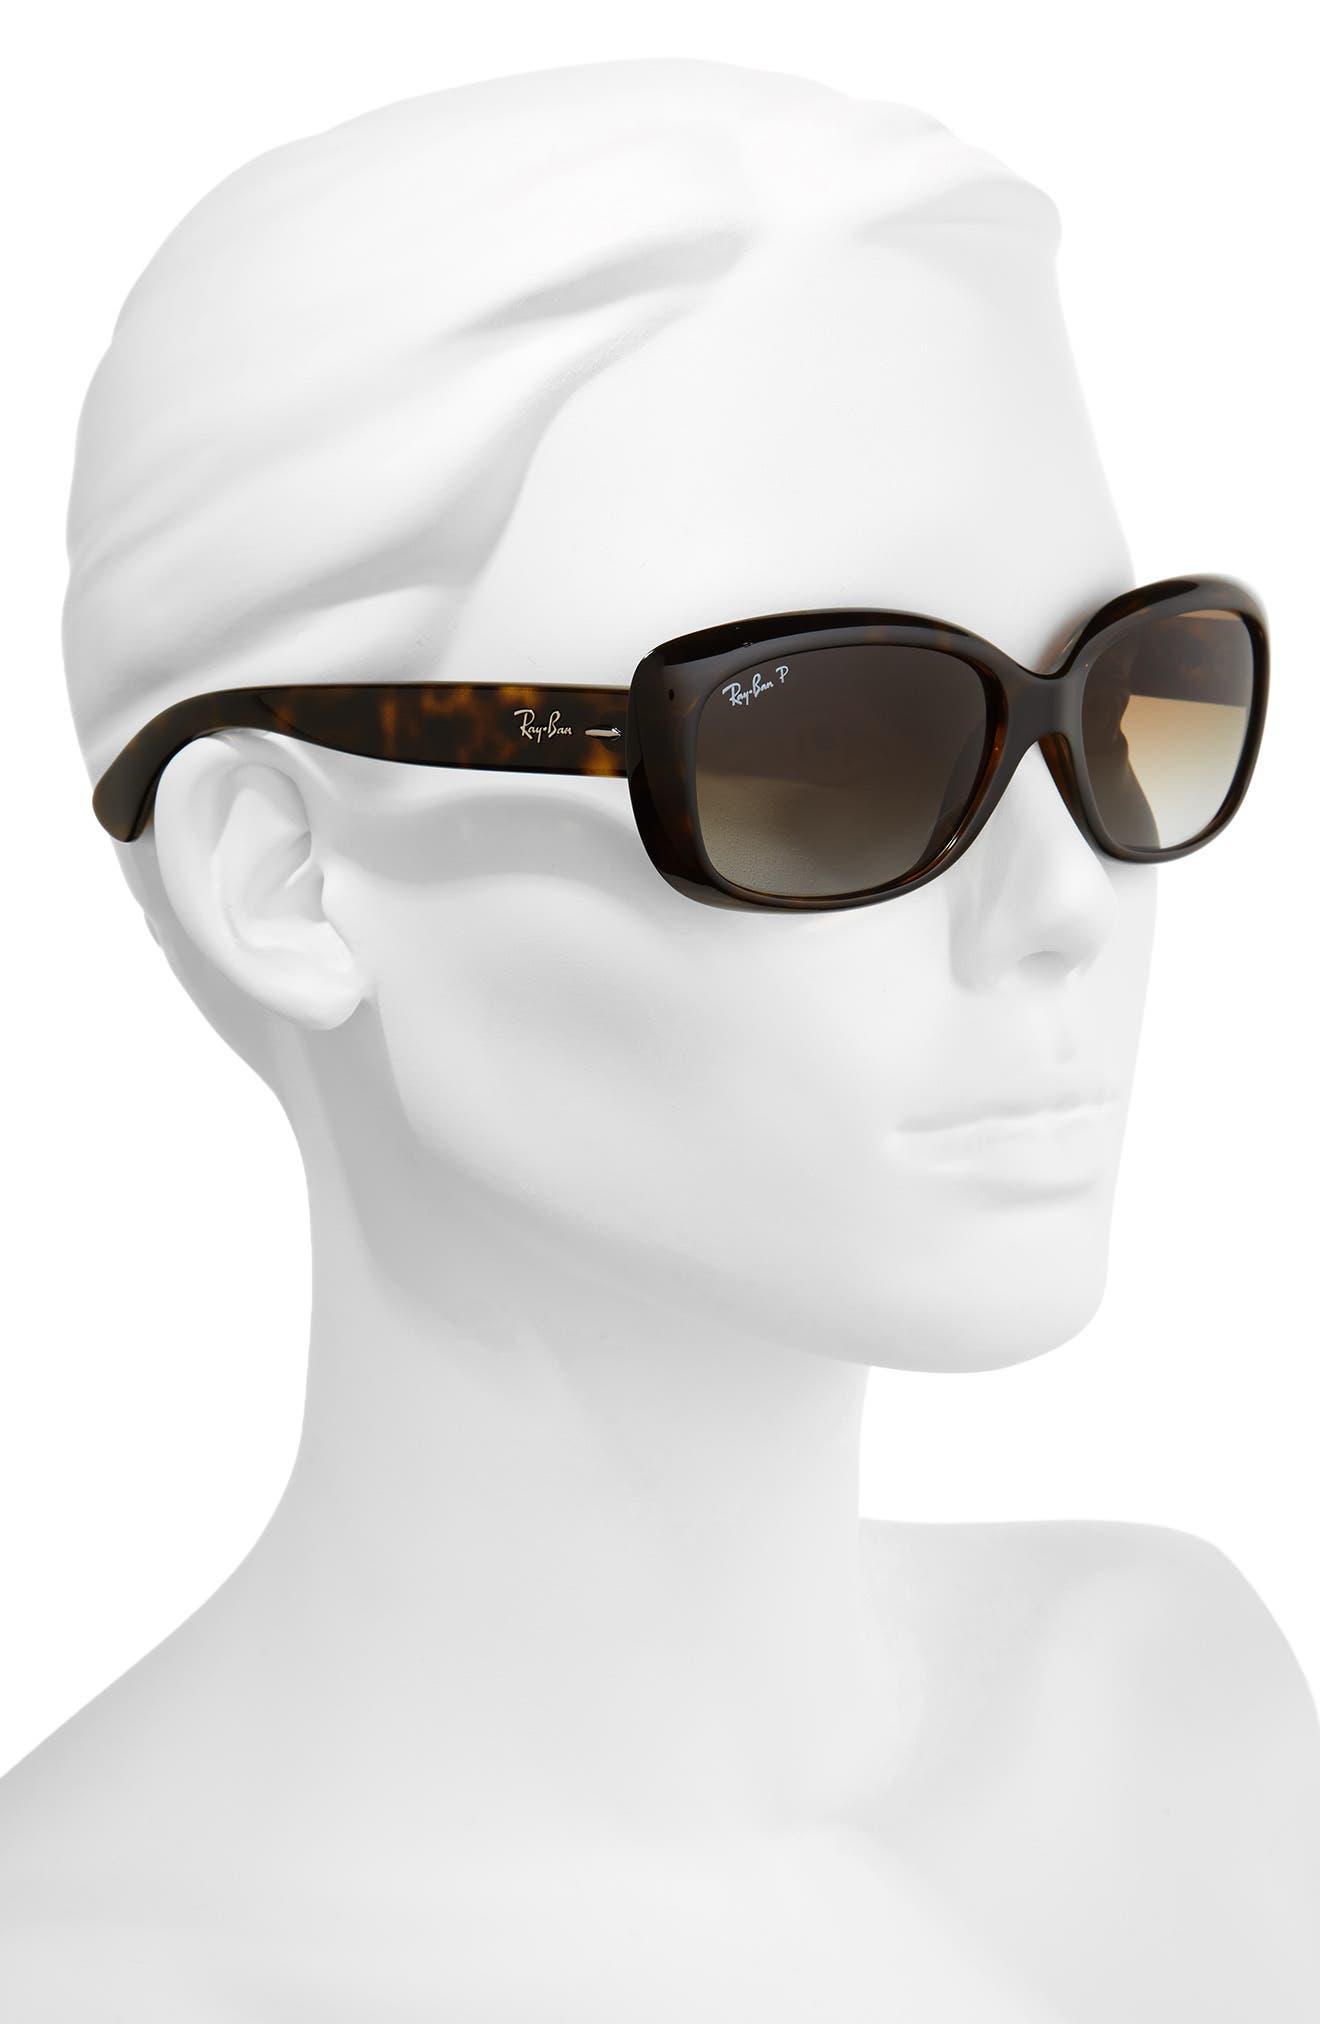 58mm Polarized Sunglasses,                             Alternate thumbnail 2, color,                             Havana